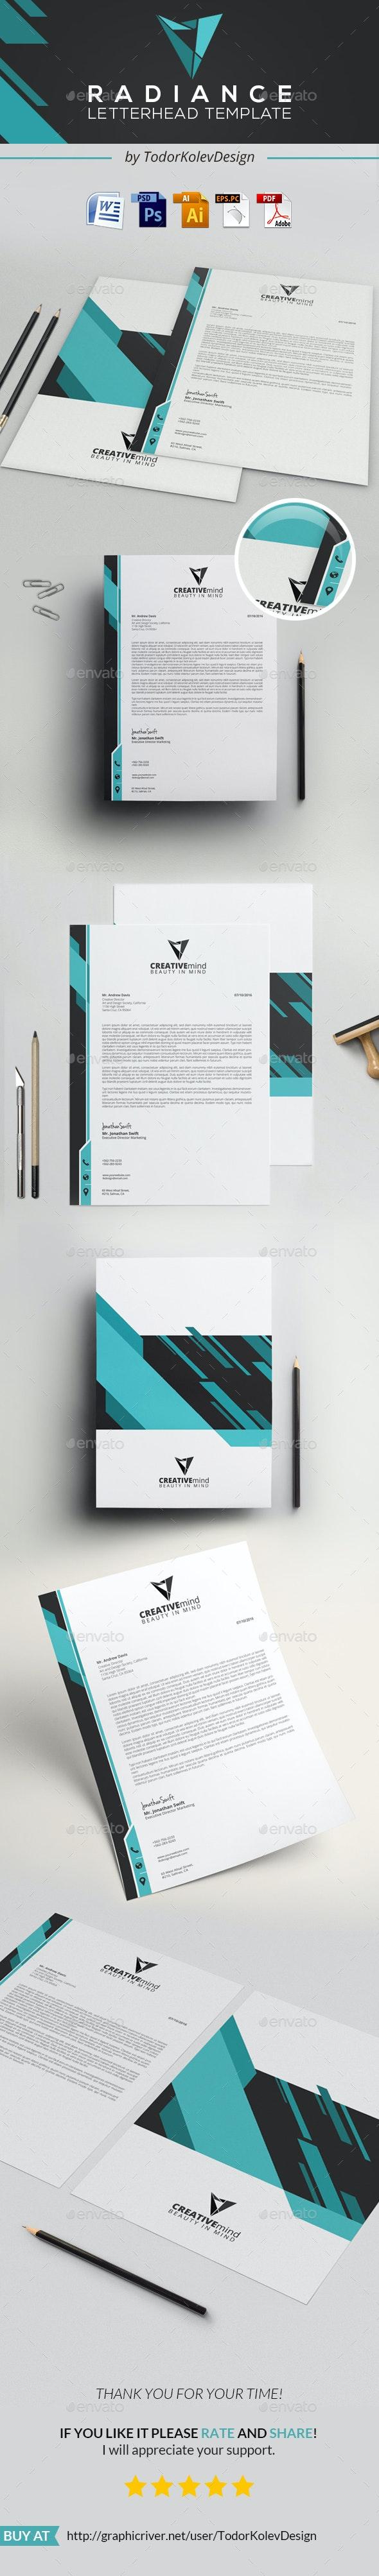 Radiance Letterhead - Stationery Print Templates